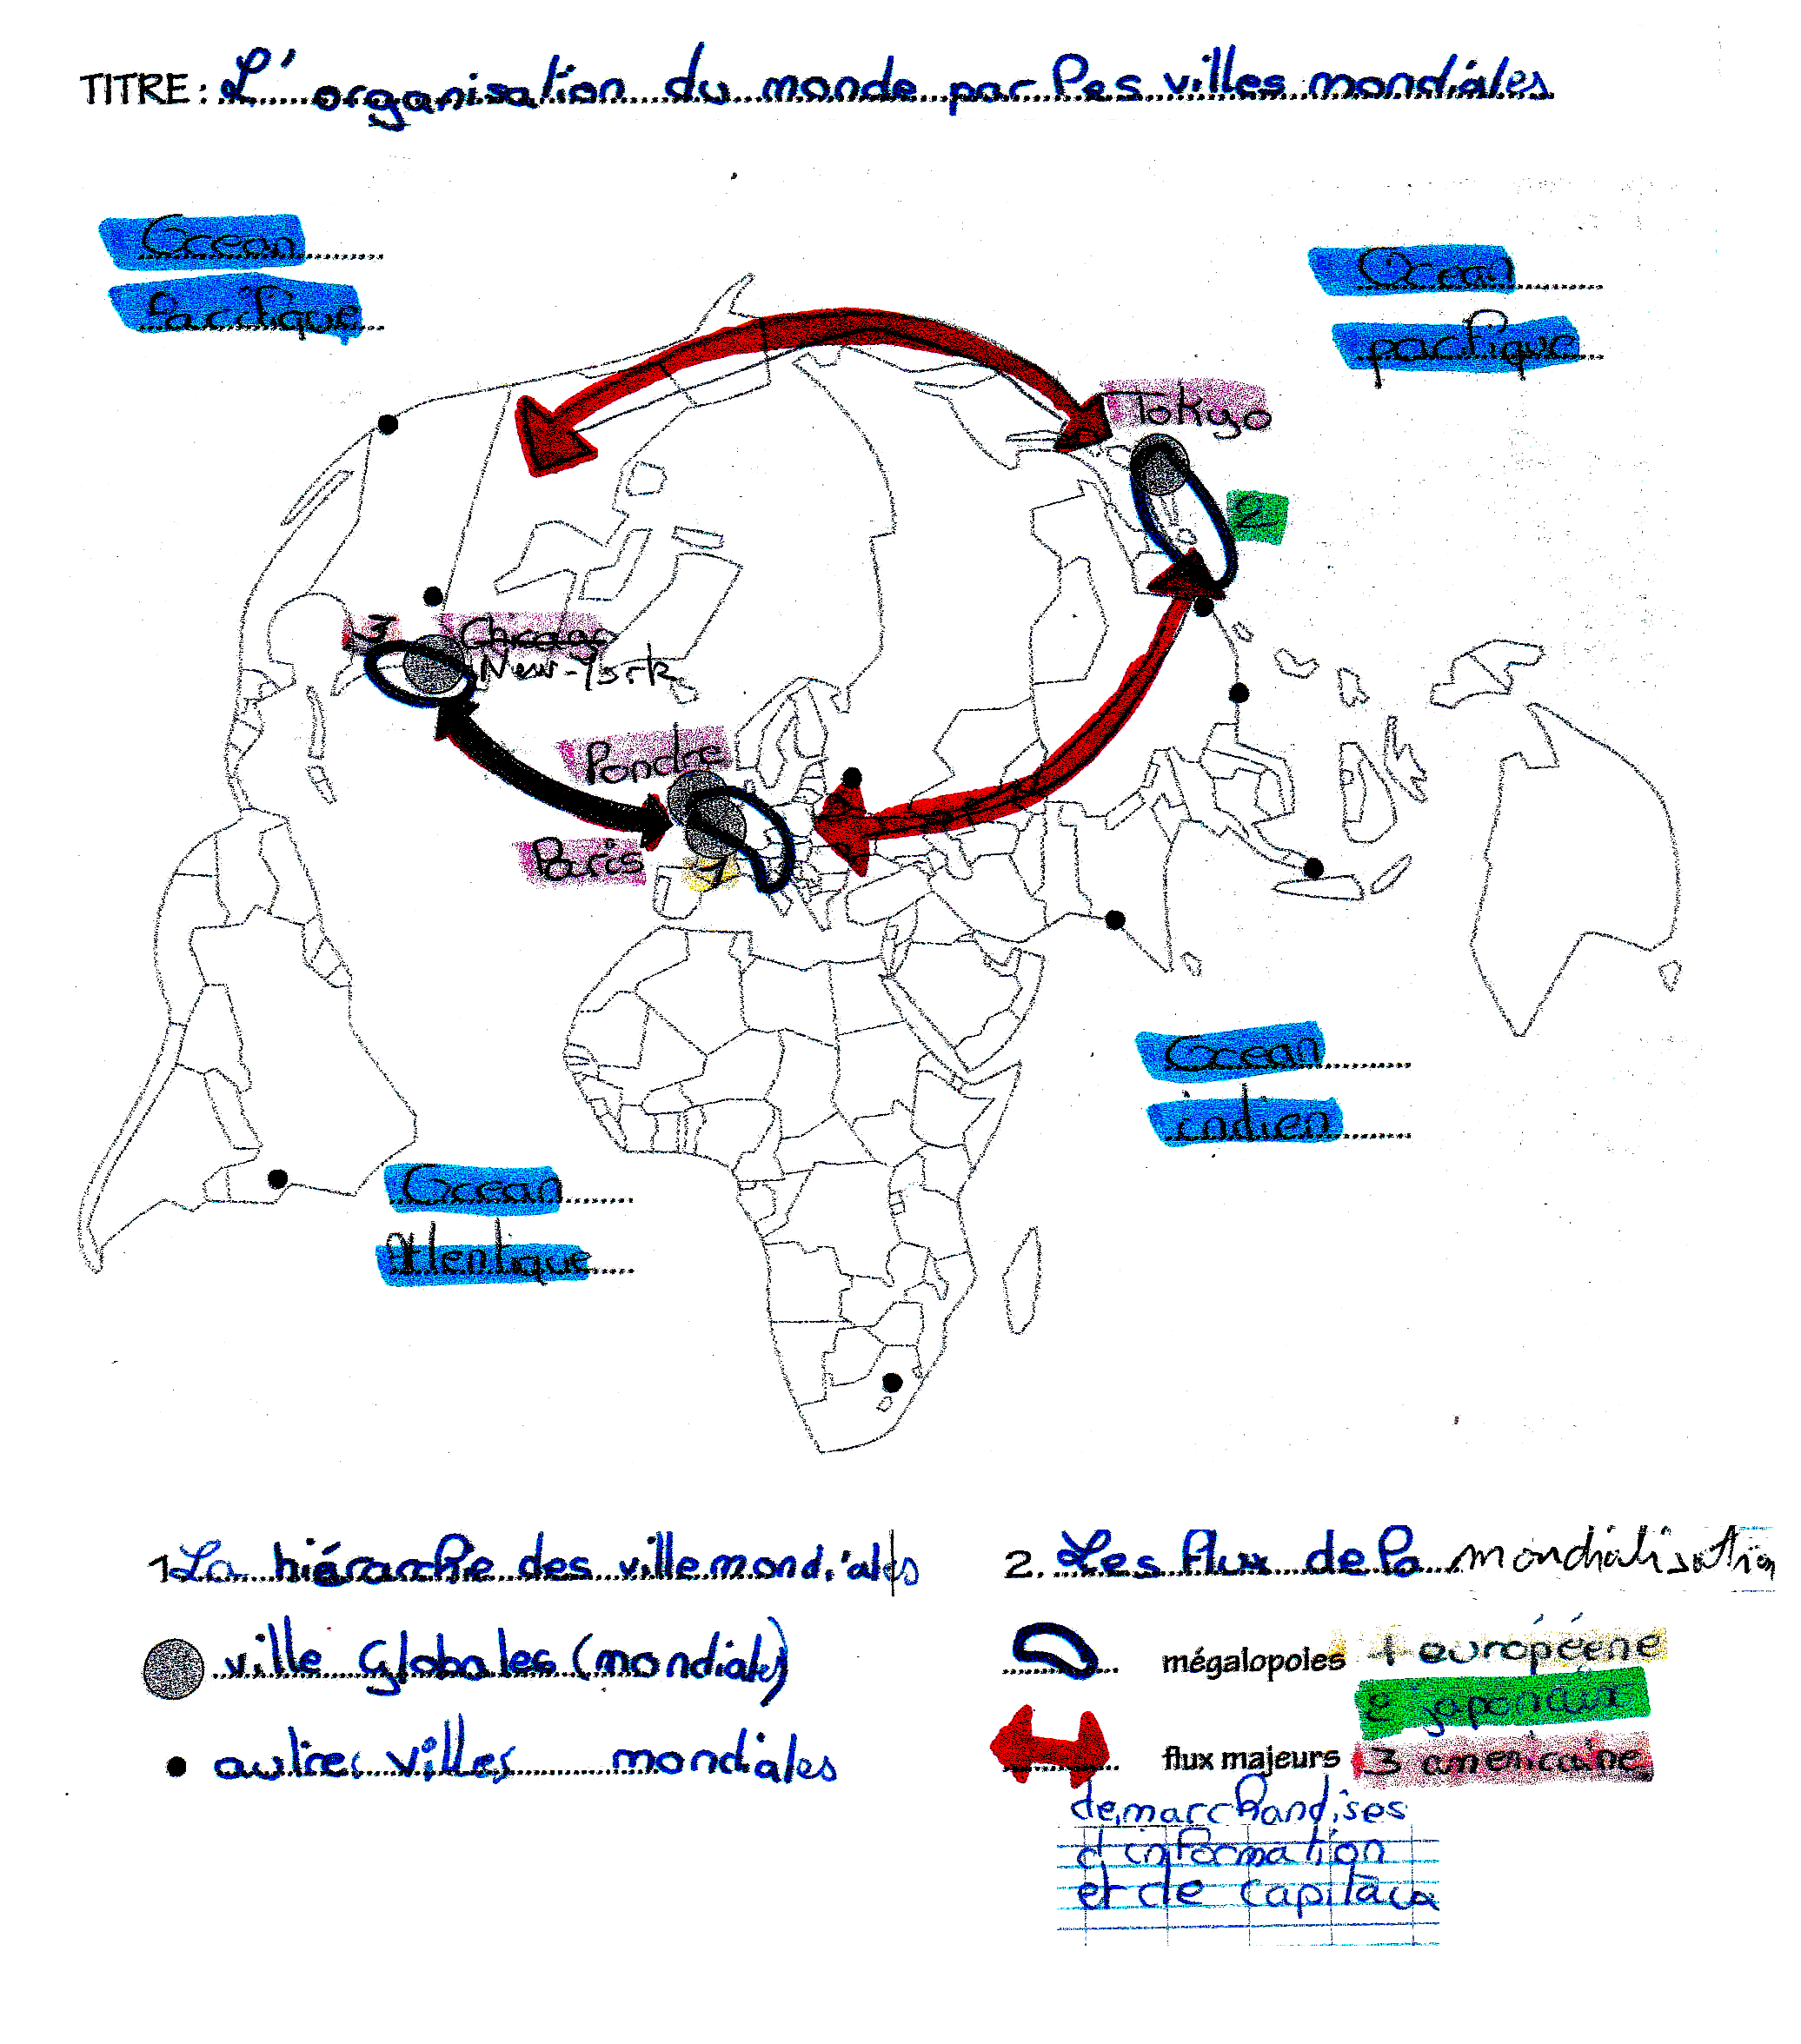 1villes-mondiales-organisation